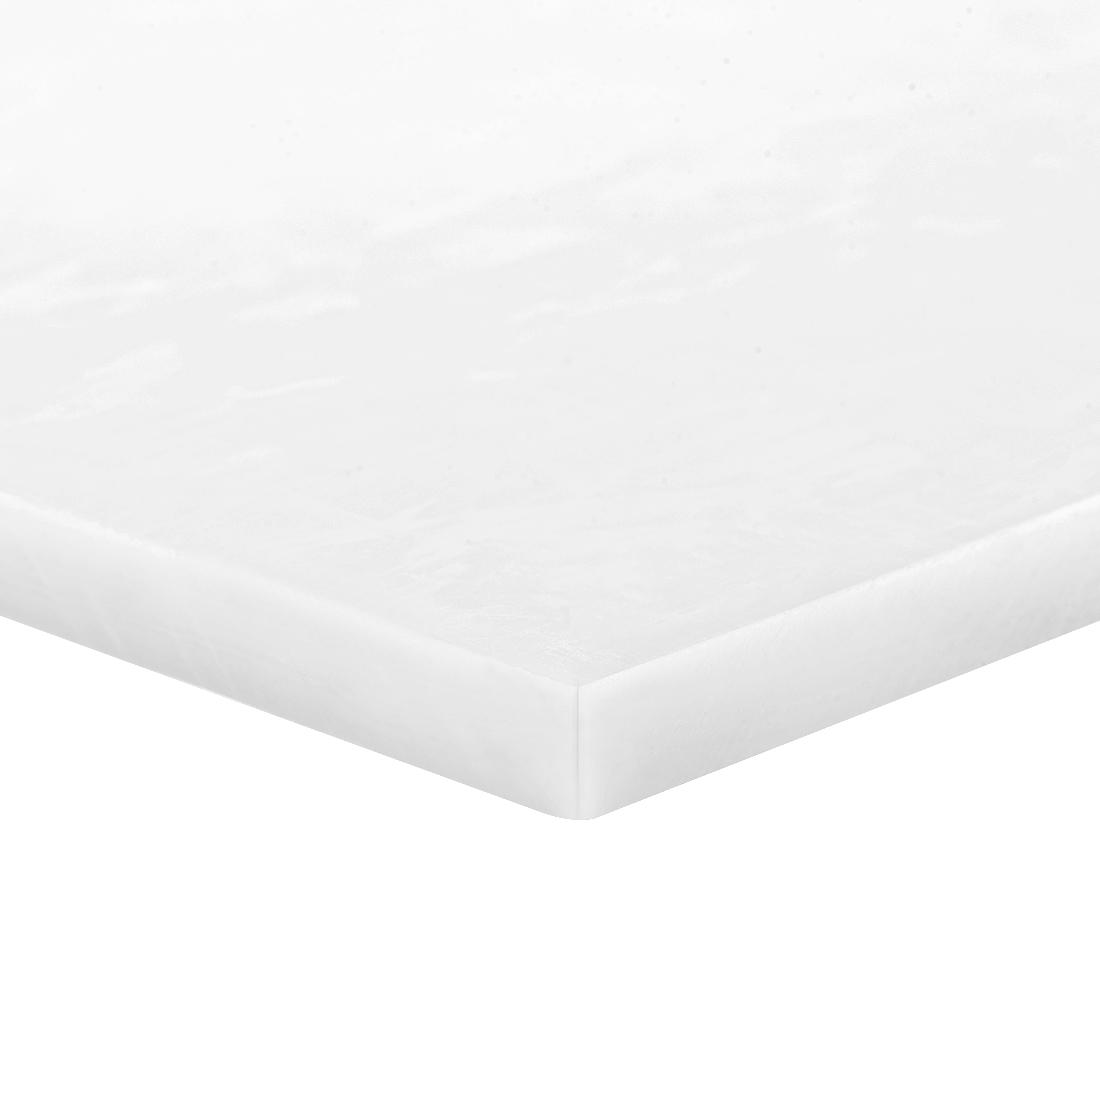 Acetal POM Sheet Polyoxymethylene Plate Sheet 150 x 200 x 5mm White 2 Pcs